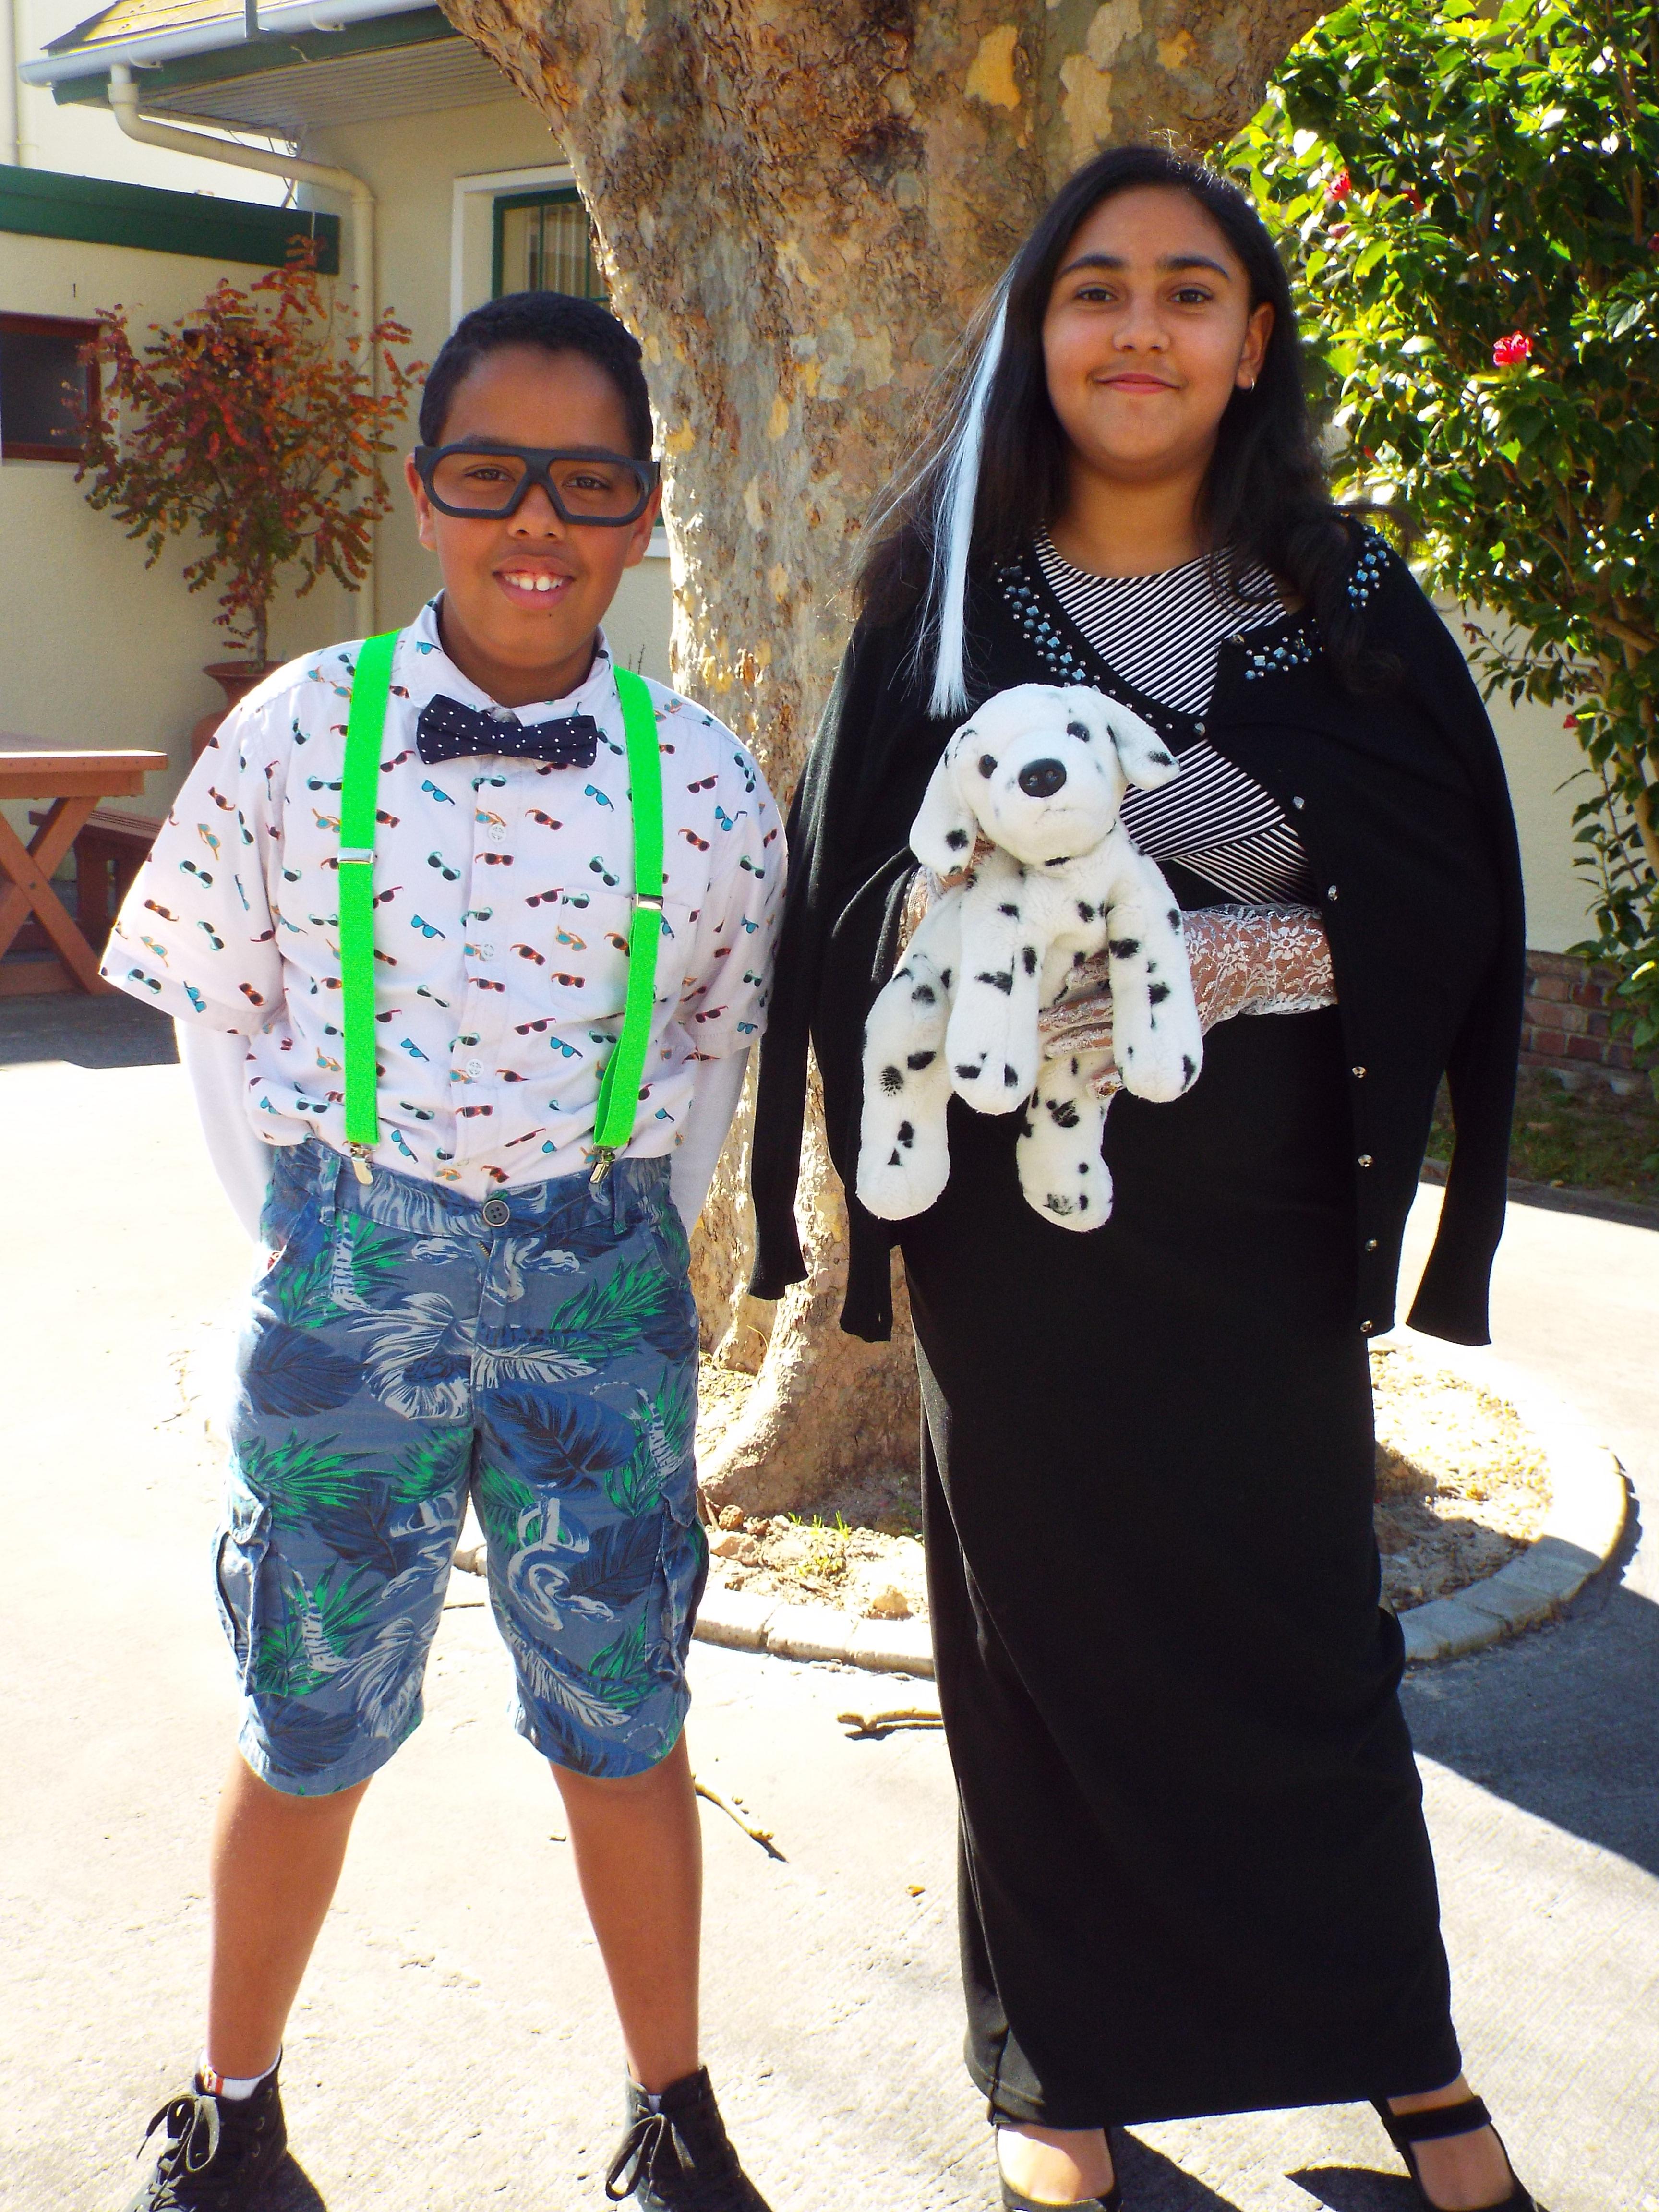 Cartoon Characters To Dress Up As : Cartoon character superhero dress up day